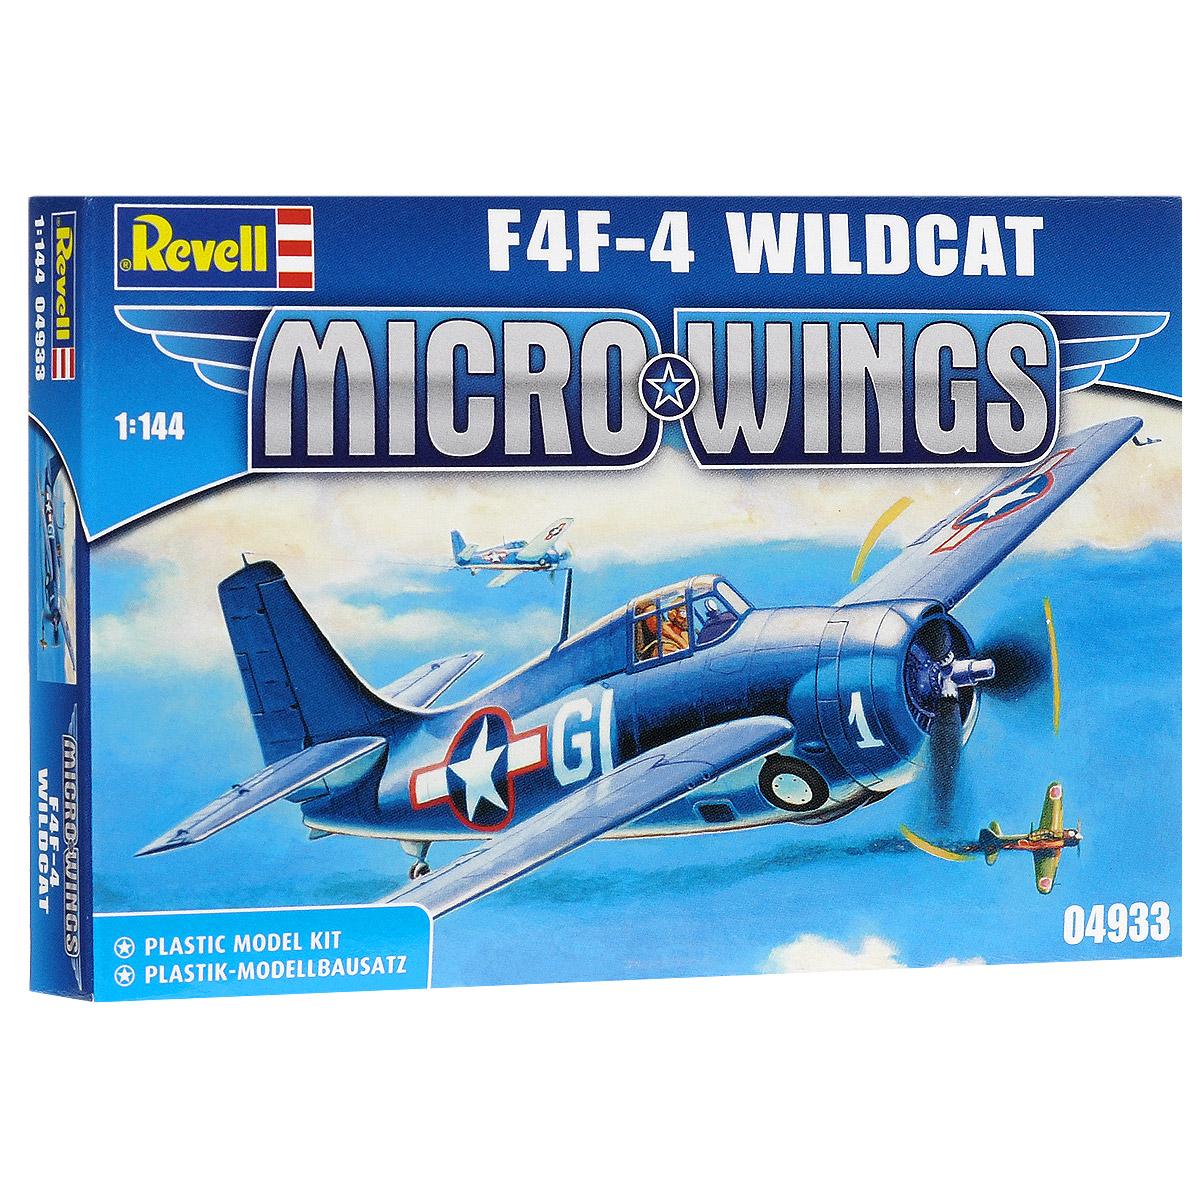 ������� ������ Revell ������� F4F-4 Wildcat - Revell04933������� ������ Revell ������� F4F-4 Wildcat ������� ��� � ������ ������� ��������� ������������� ������� �� ������ �����. ����� �������� � ���� 18 ����������� ���������, �� ������� ����� ������� ����������� ����������� ����� ������������